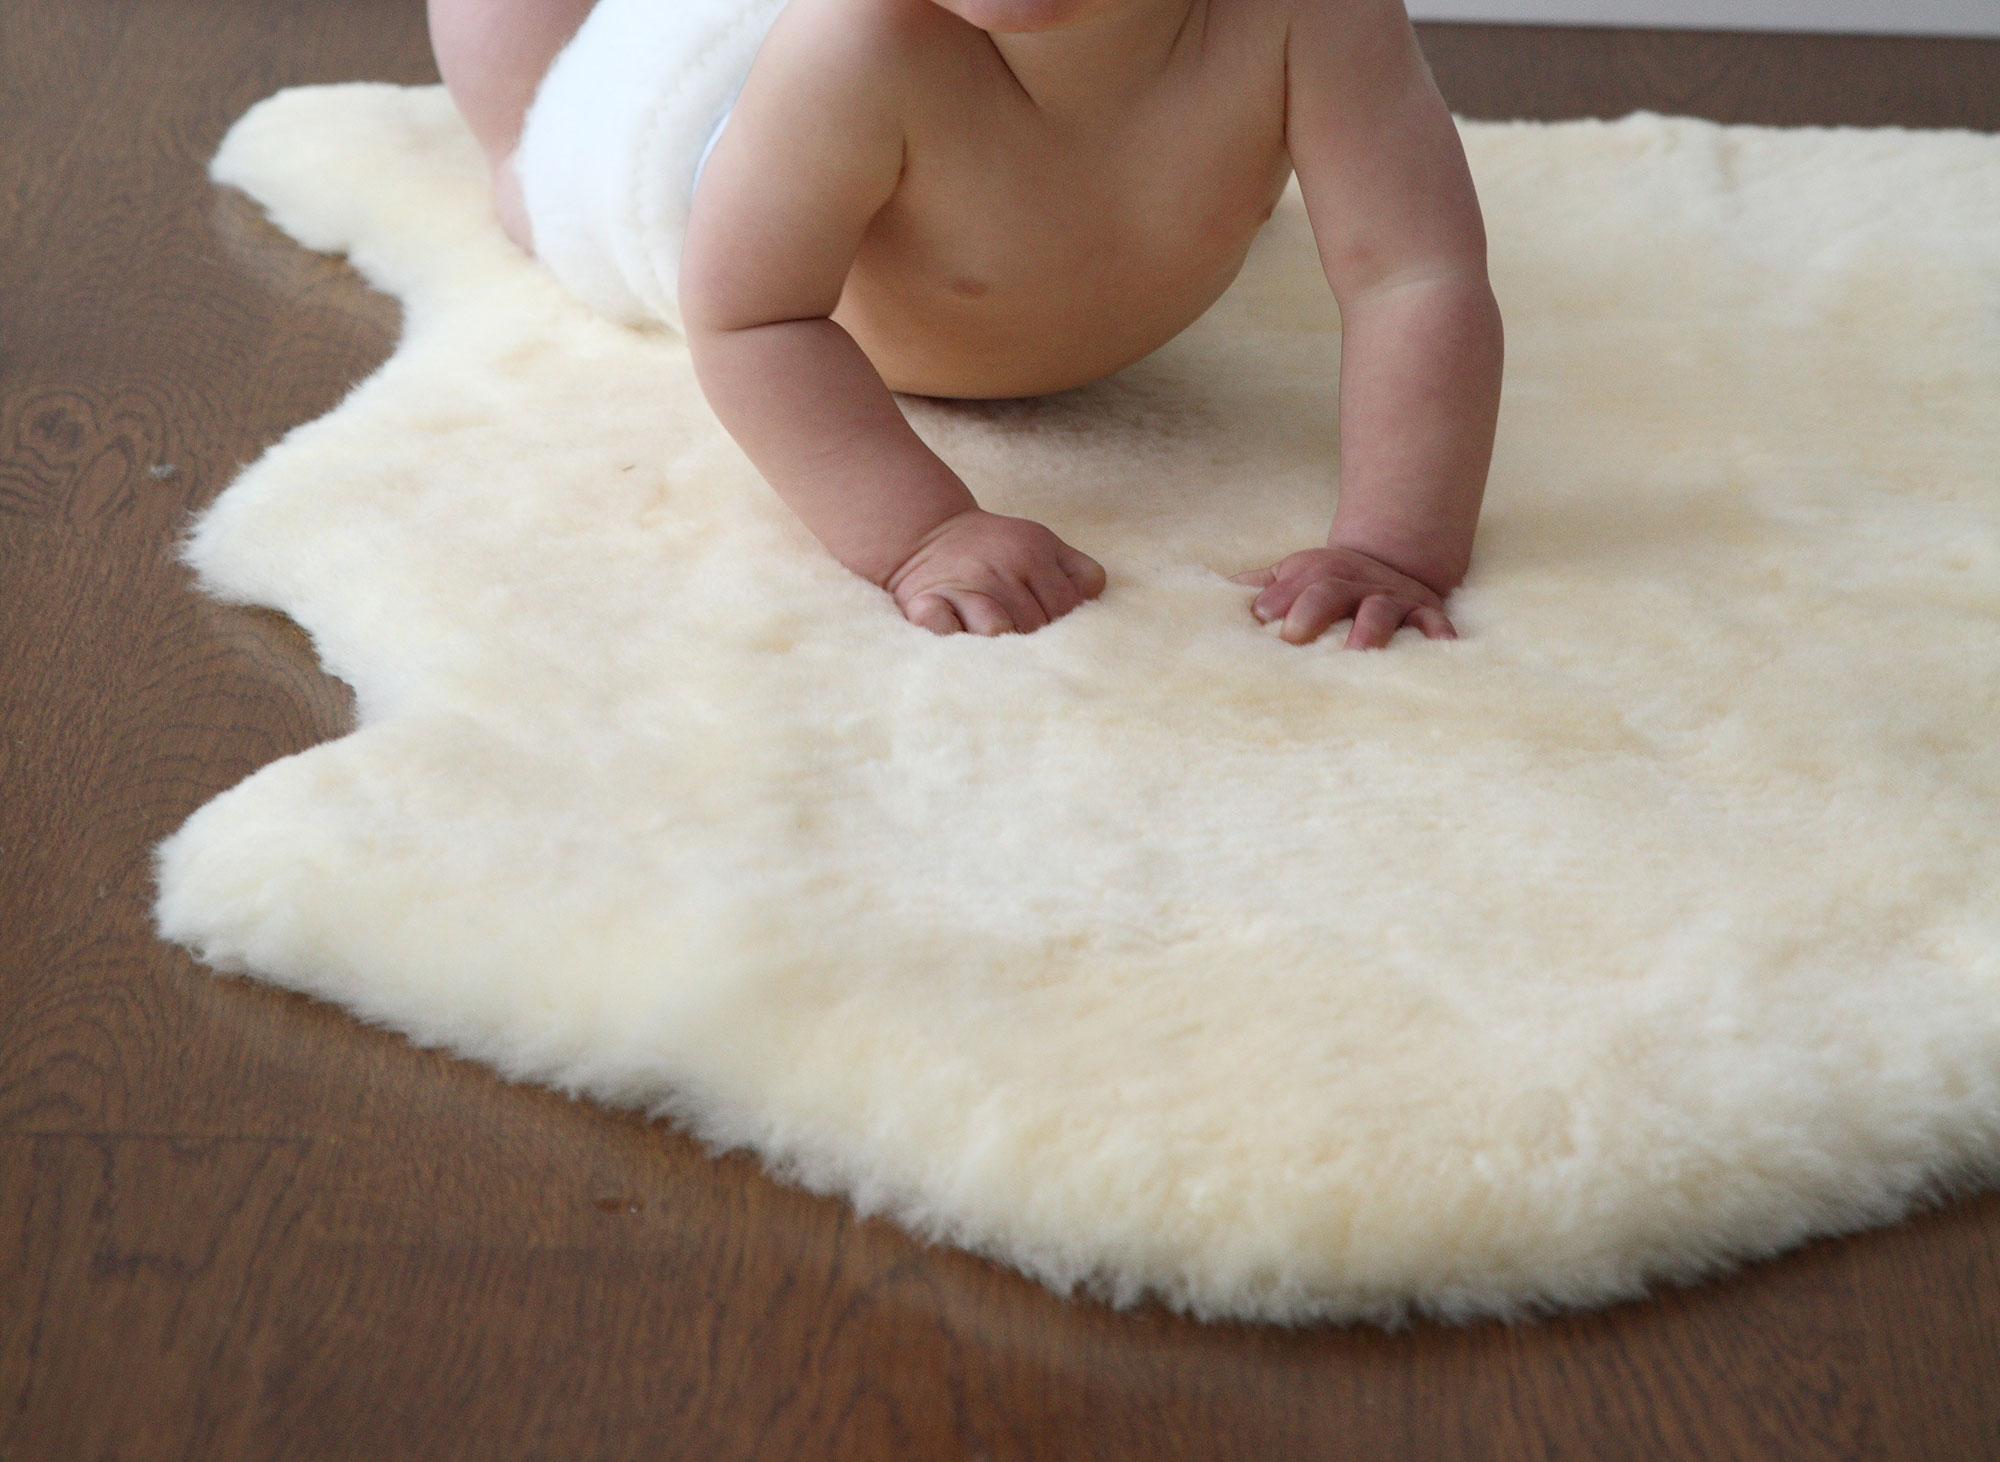 Shorn Sheepskin Infant Care Rug for Baby